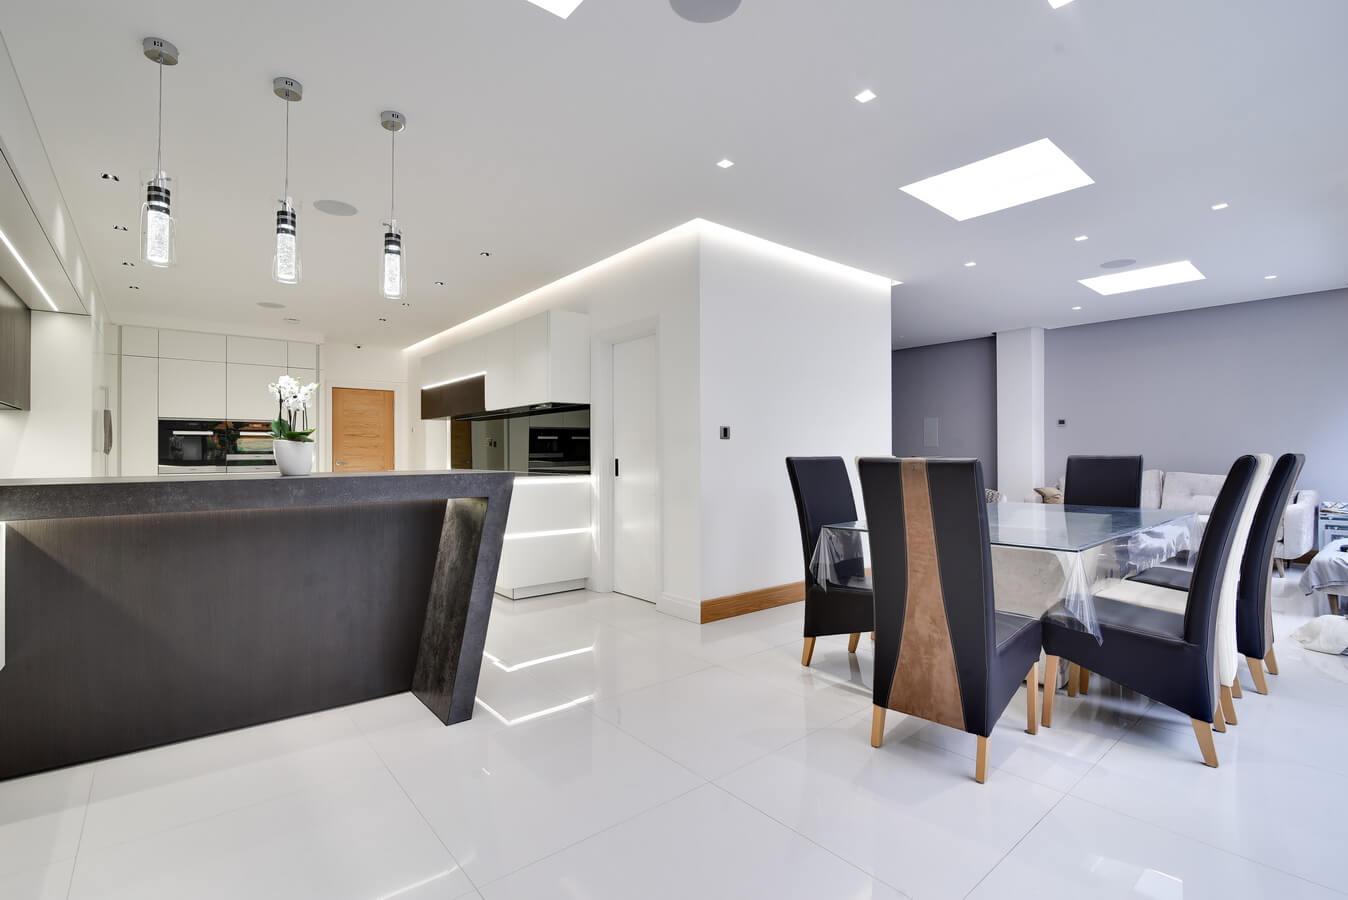 Kitchen-dining-area-Warendorf-London.jpg